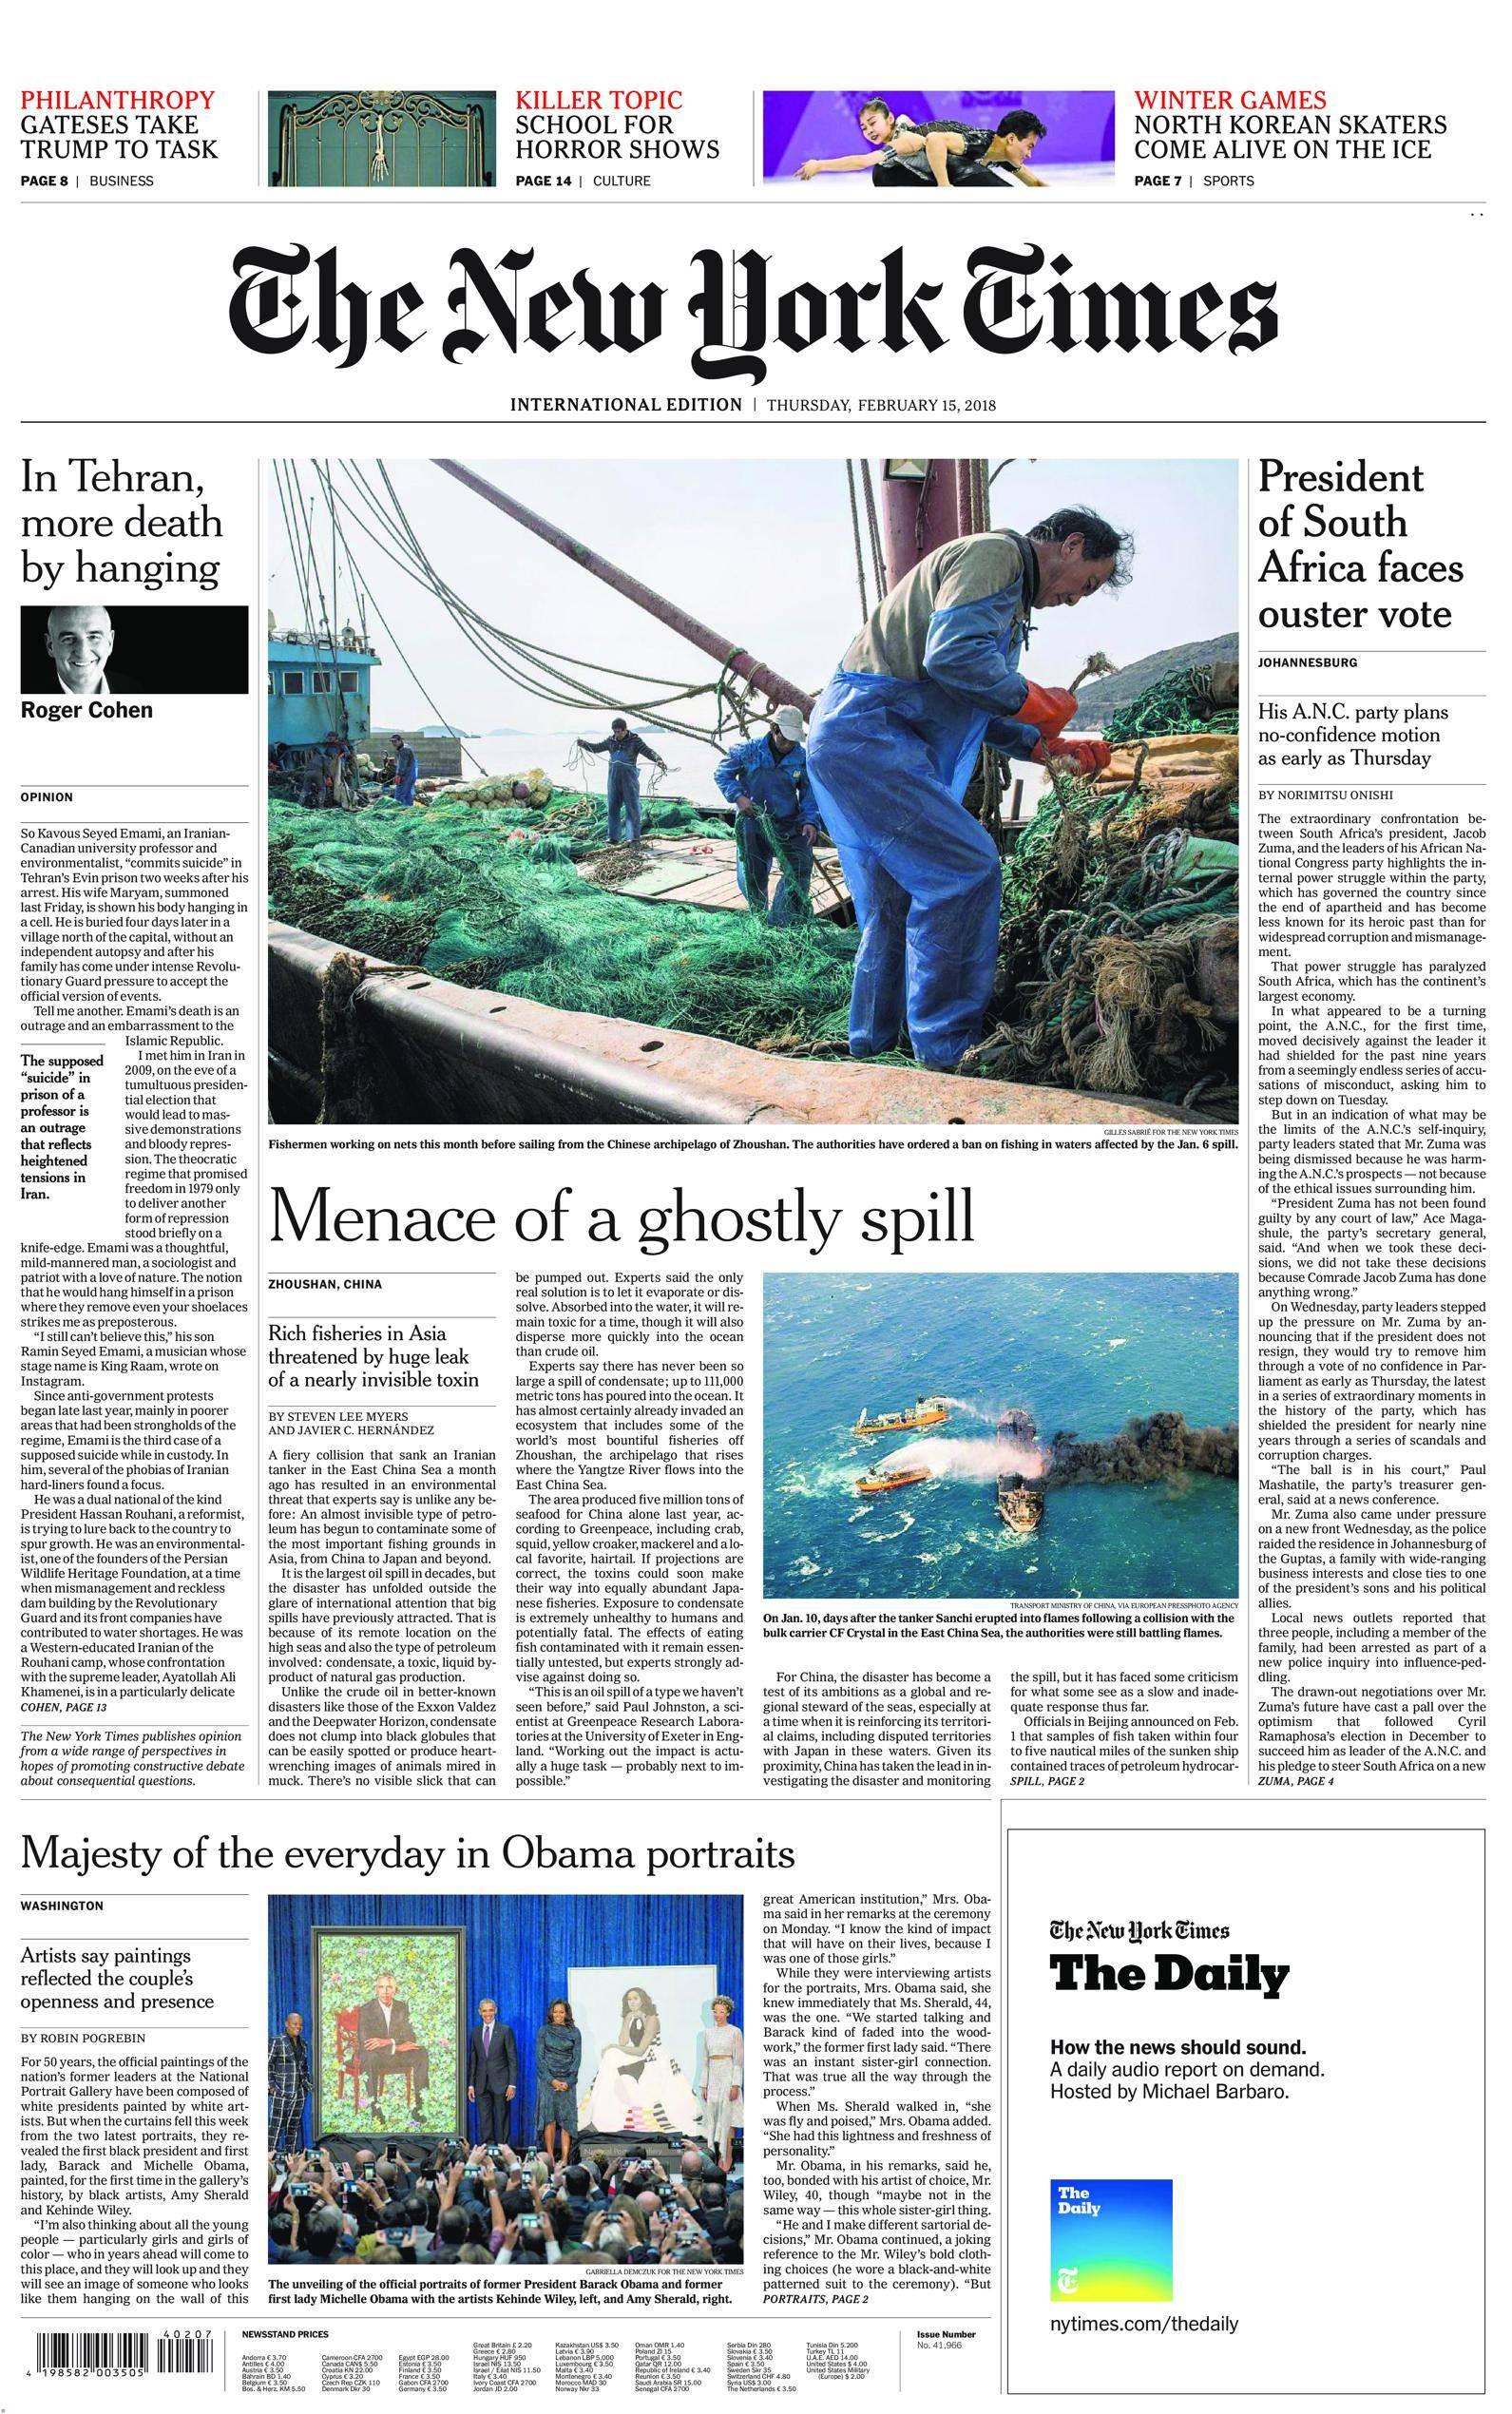 International New York Times - 15 February 2018